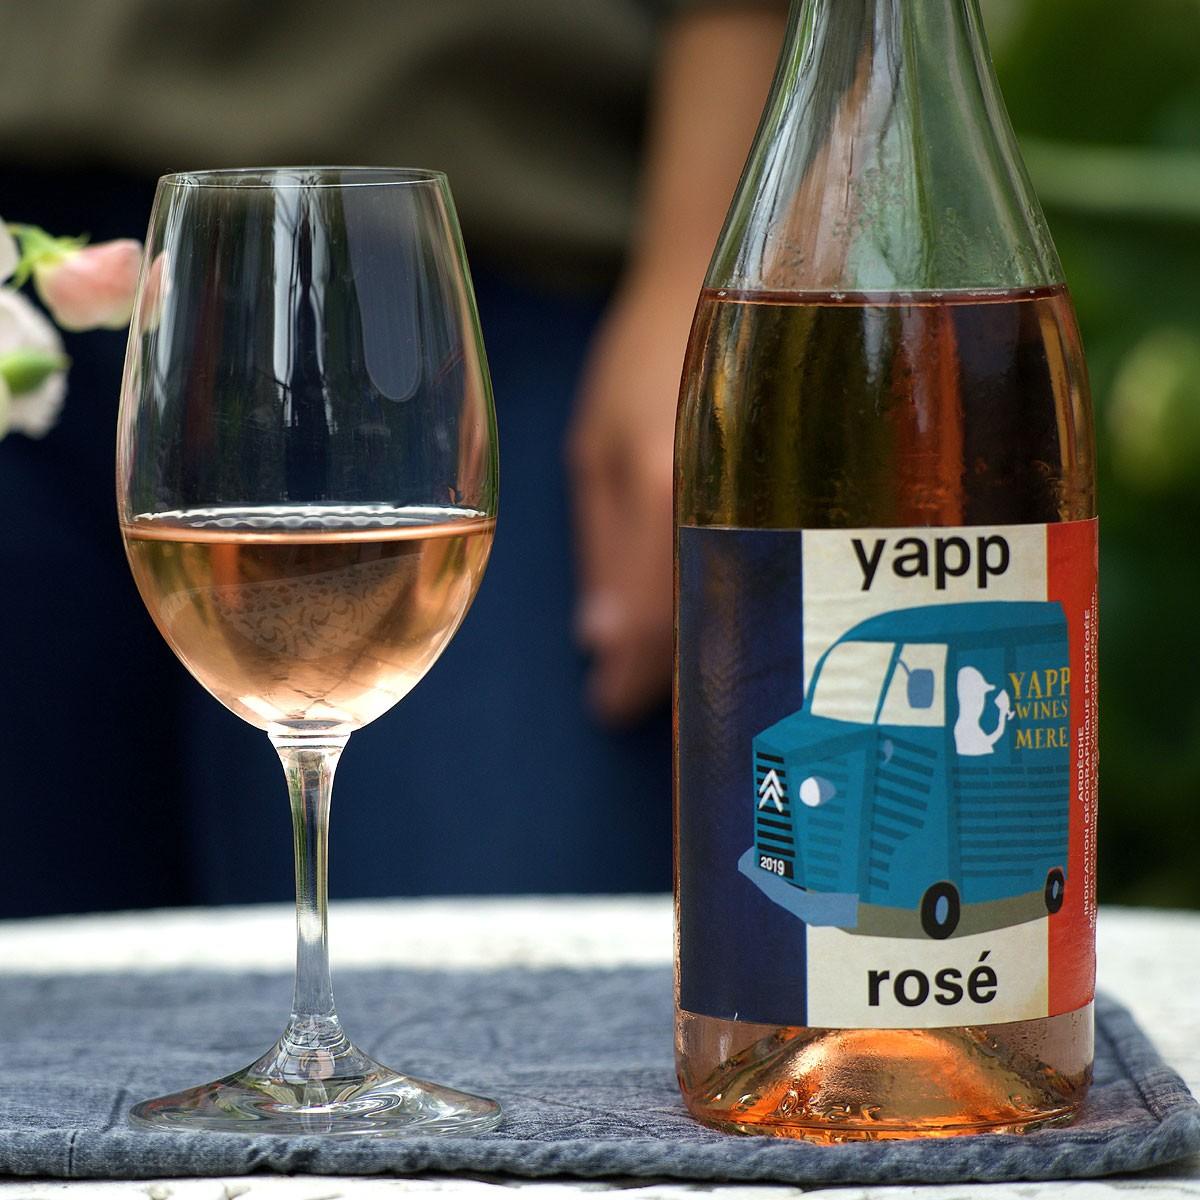 Yapp Rosé 2019 - Lifestyle